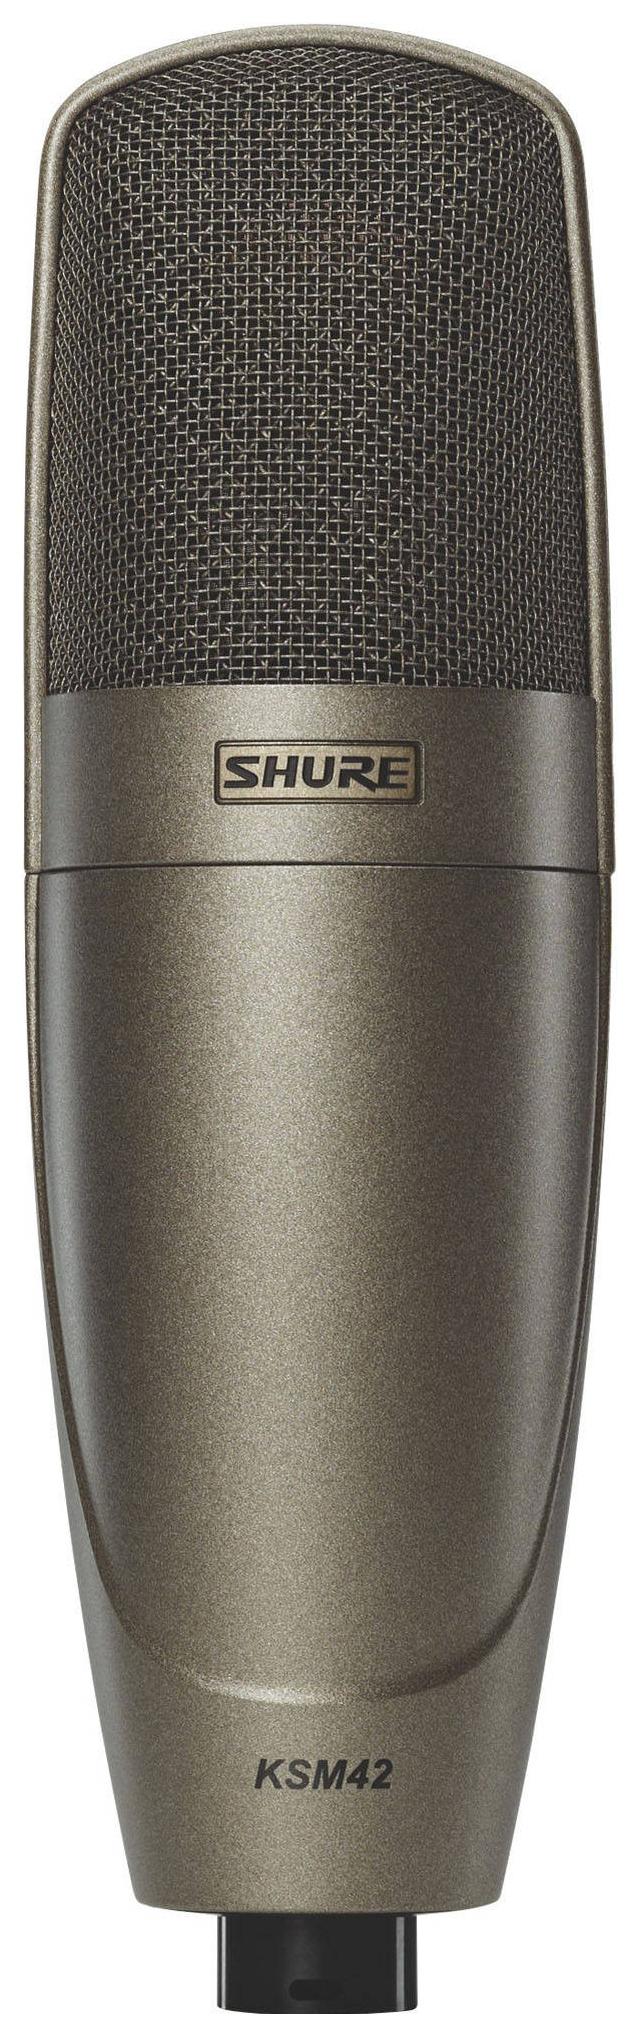 Микрофон Shure KSM42/SG